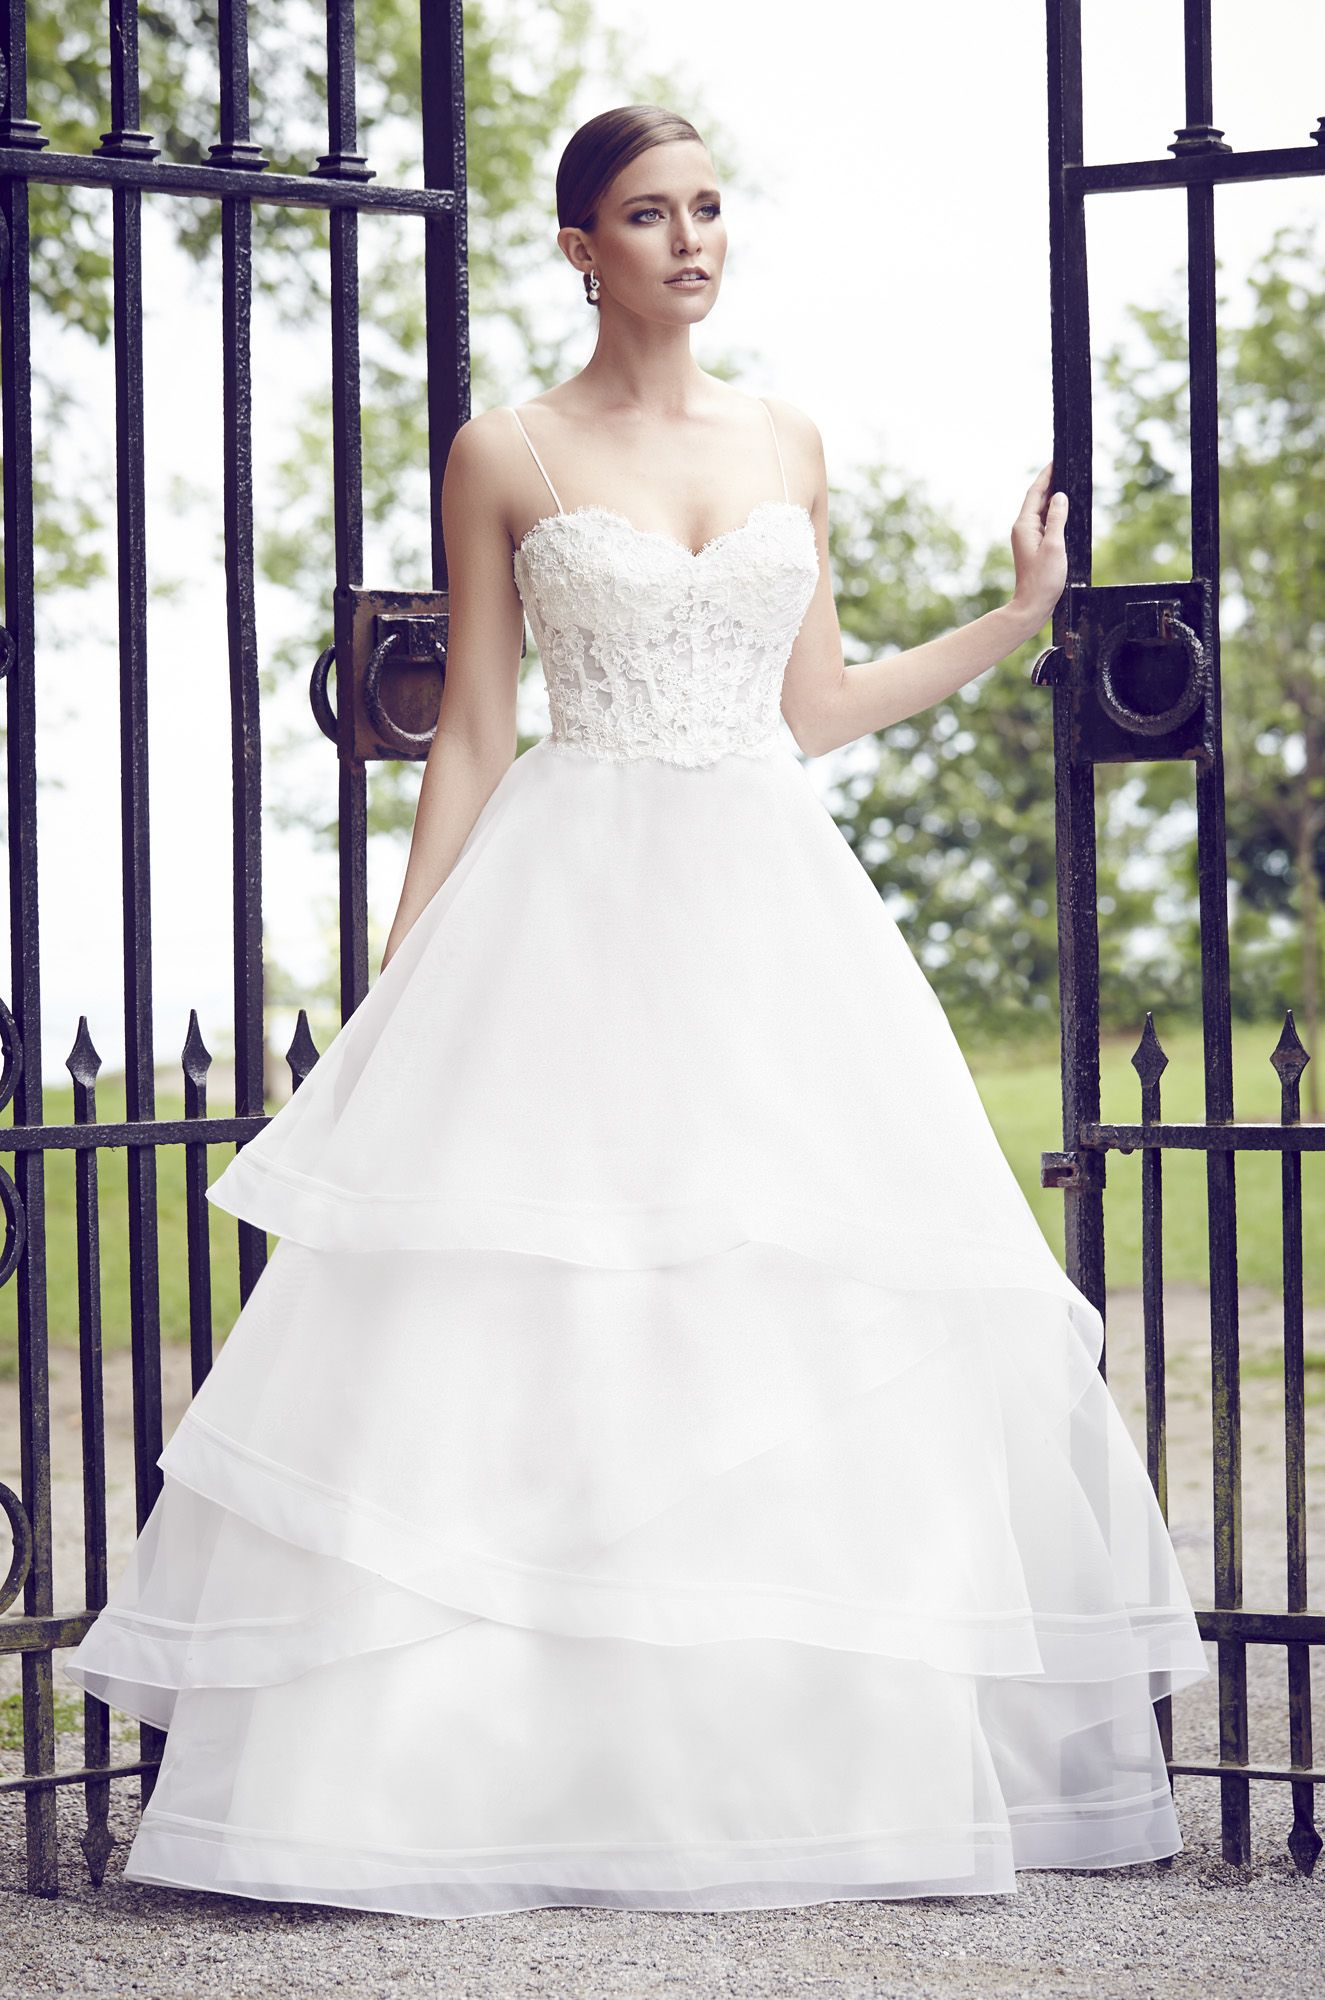 Wedding dresses styles  Paloma Blanca   Gowns in Jacksonville  Pinterest  Paloma